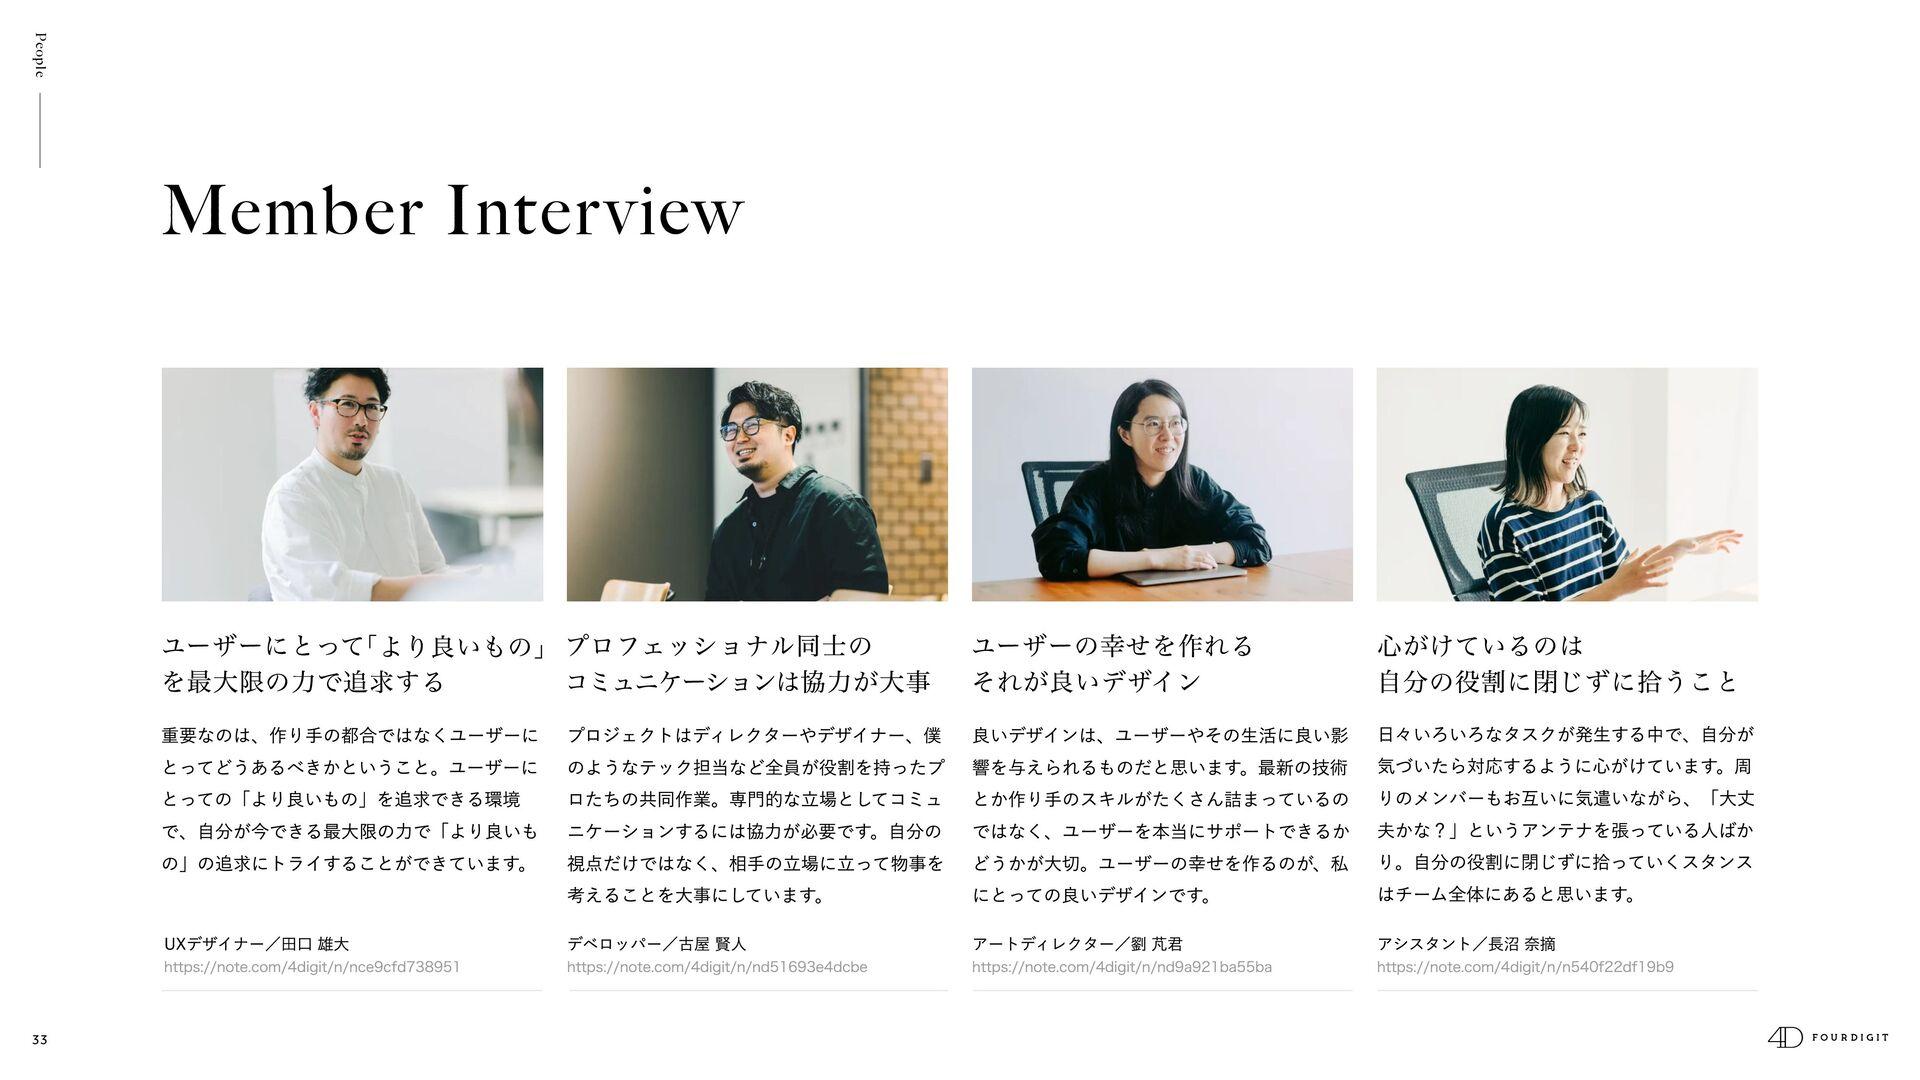 33 People デベロッパー / ⻄垣 伸之 視野の広いエンジニアが プロジェクトの成功を...